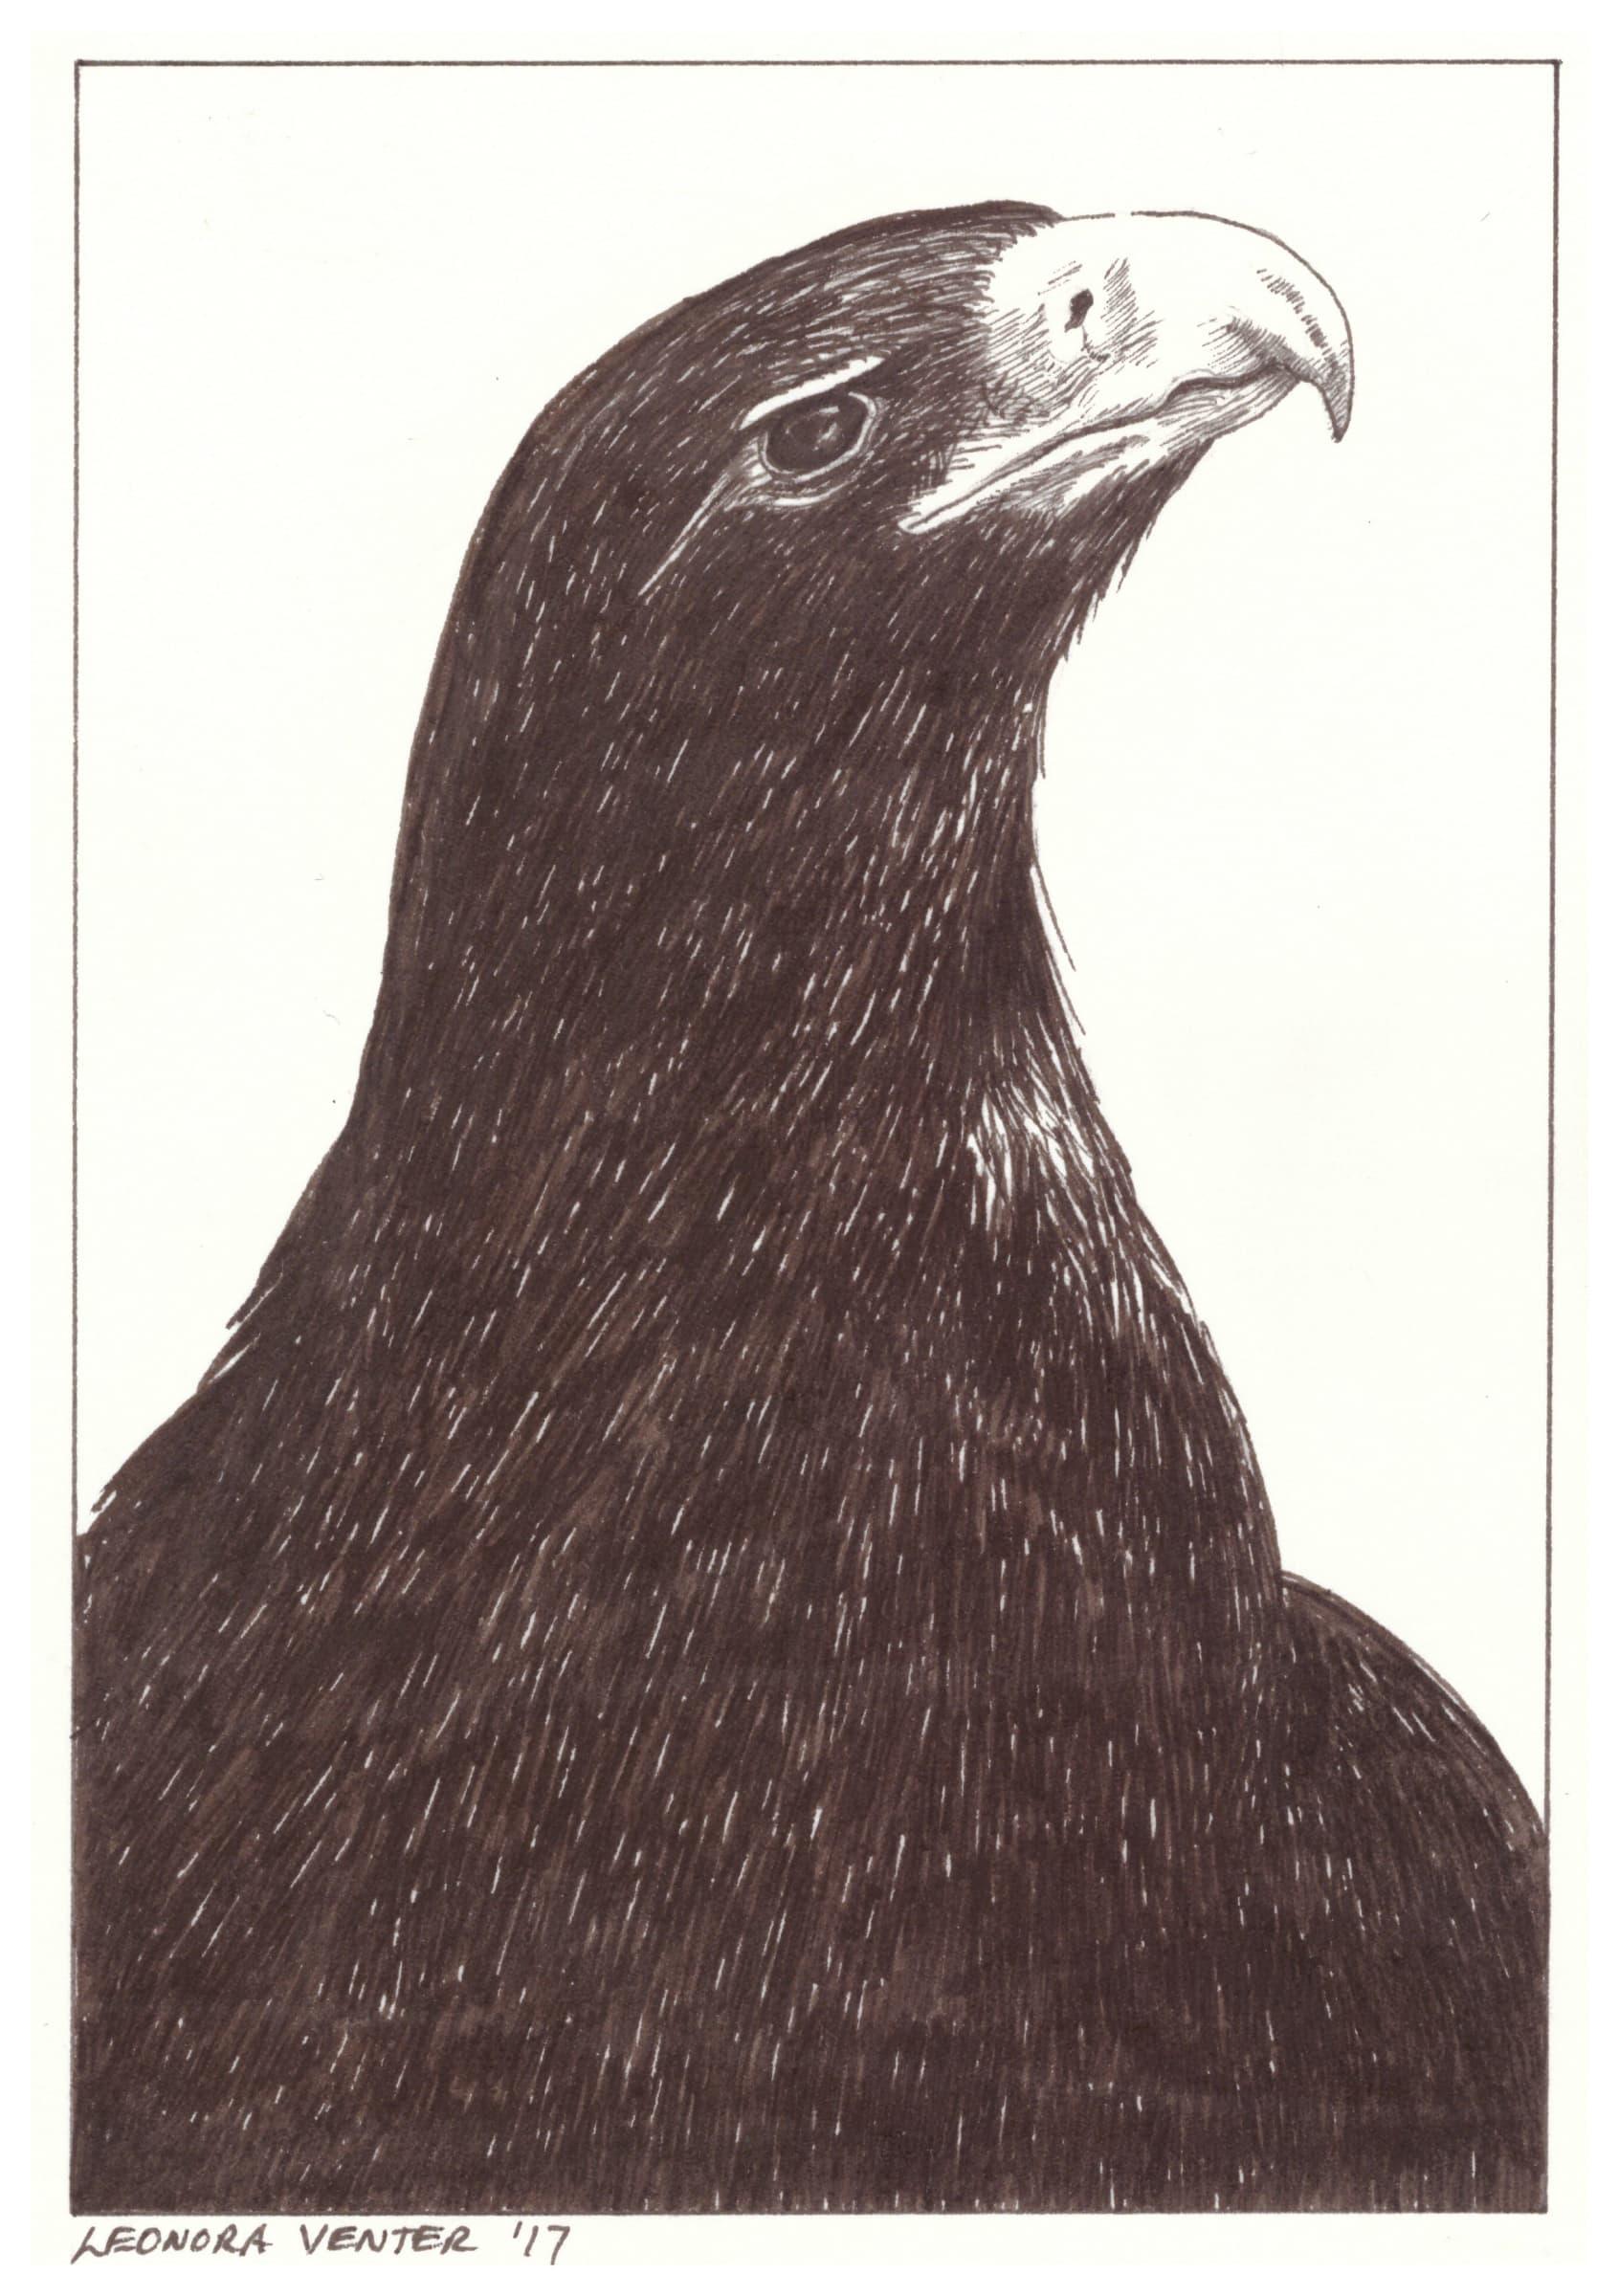 <span class=&#34;link fancybox-details-link&#34;><a href=&#34;/artists/71-leonora-venter/works/2261-leonora-venter-eagle-2017/&#34;>View Detail Page</a></span><div class=&#34;artist&#34;><strong>Leonora Venter</strong></div> <div class=&#34;title&#34;><em>Eagle</em>, 2017</div> <div class=&#34;medium&#34;>Ink On Paper</div> <div class=&#34;dimensions&#34;>14.5cm x 10.5cm</div><div class=&#34;price&#34;>R600.00</div>